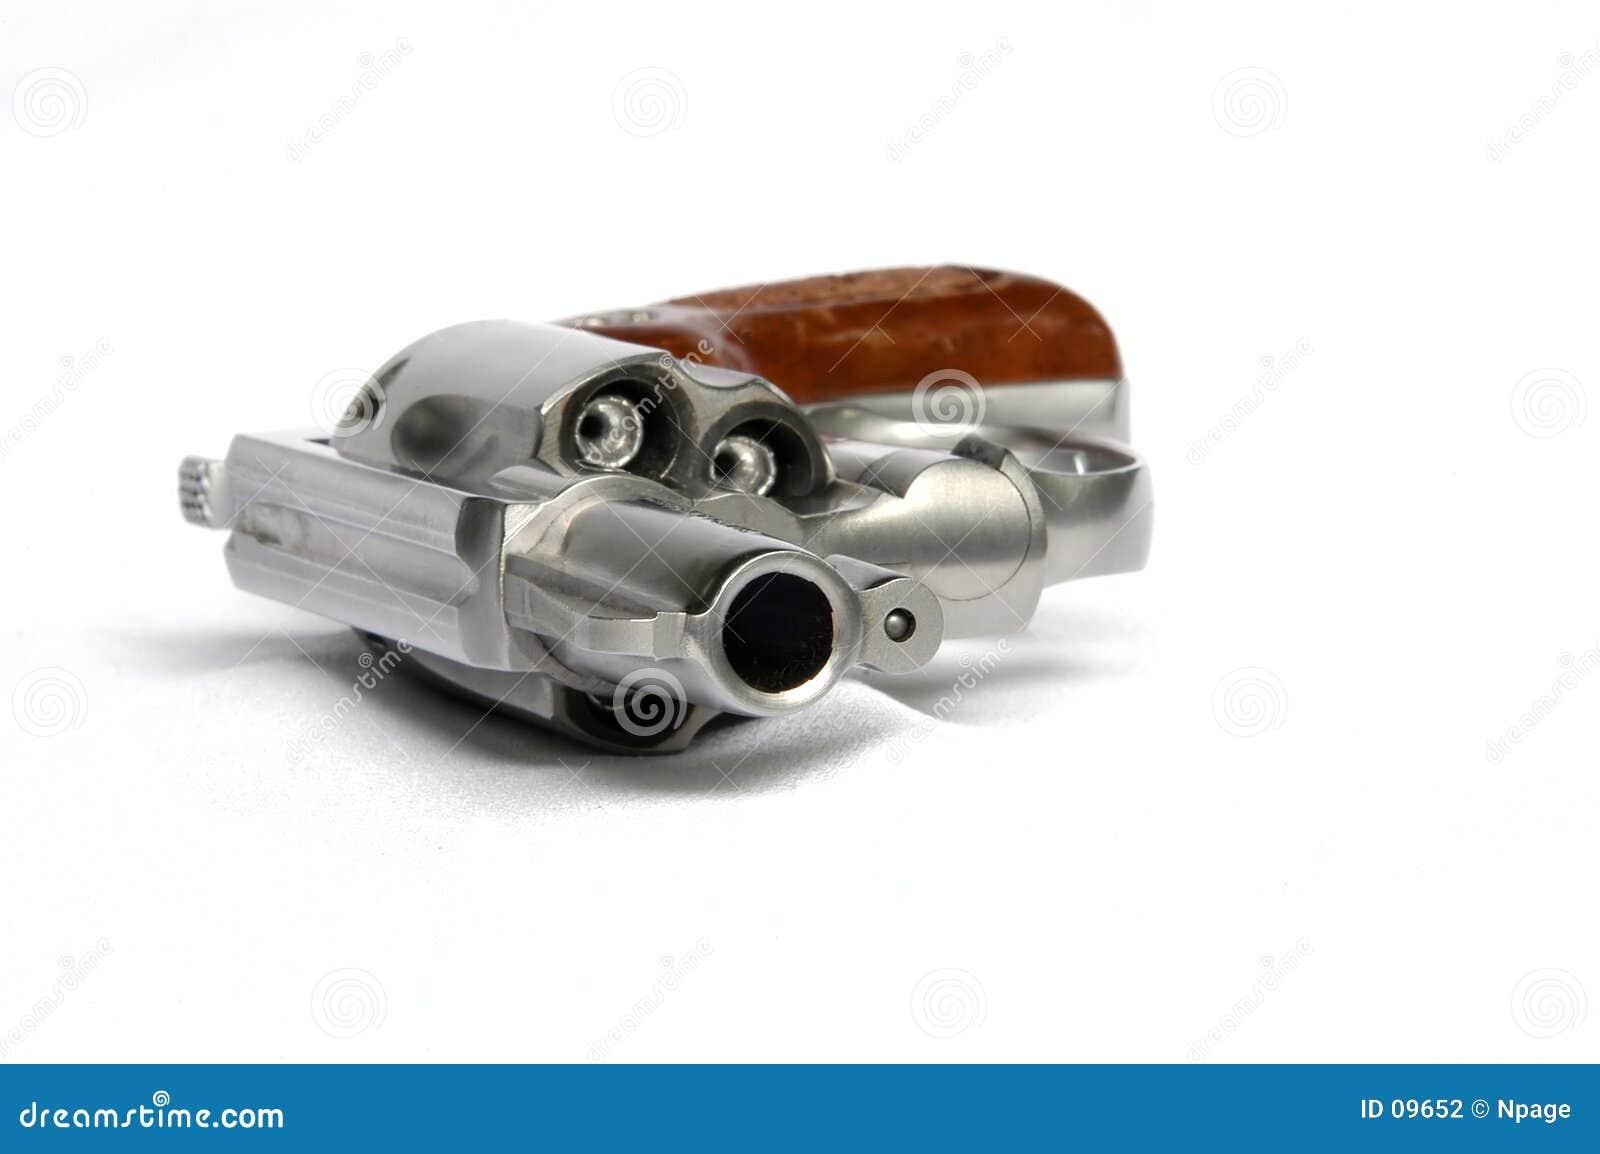 No 2 pistolet